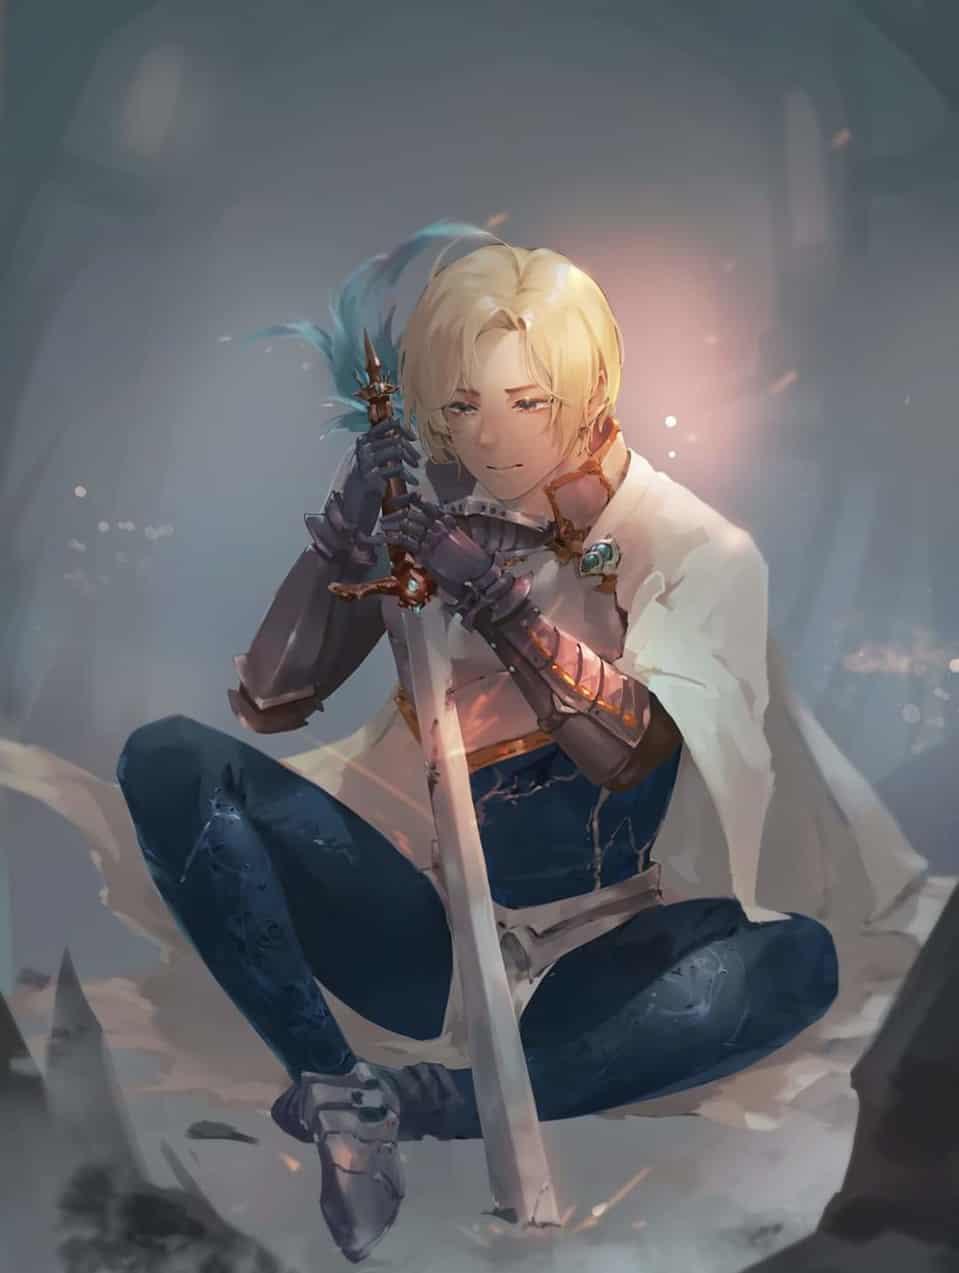 Savior--defeat Illust of Peace male 剣 boy 男 男性キャラ